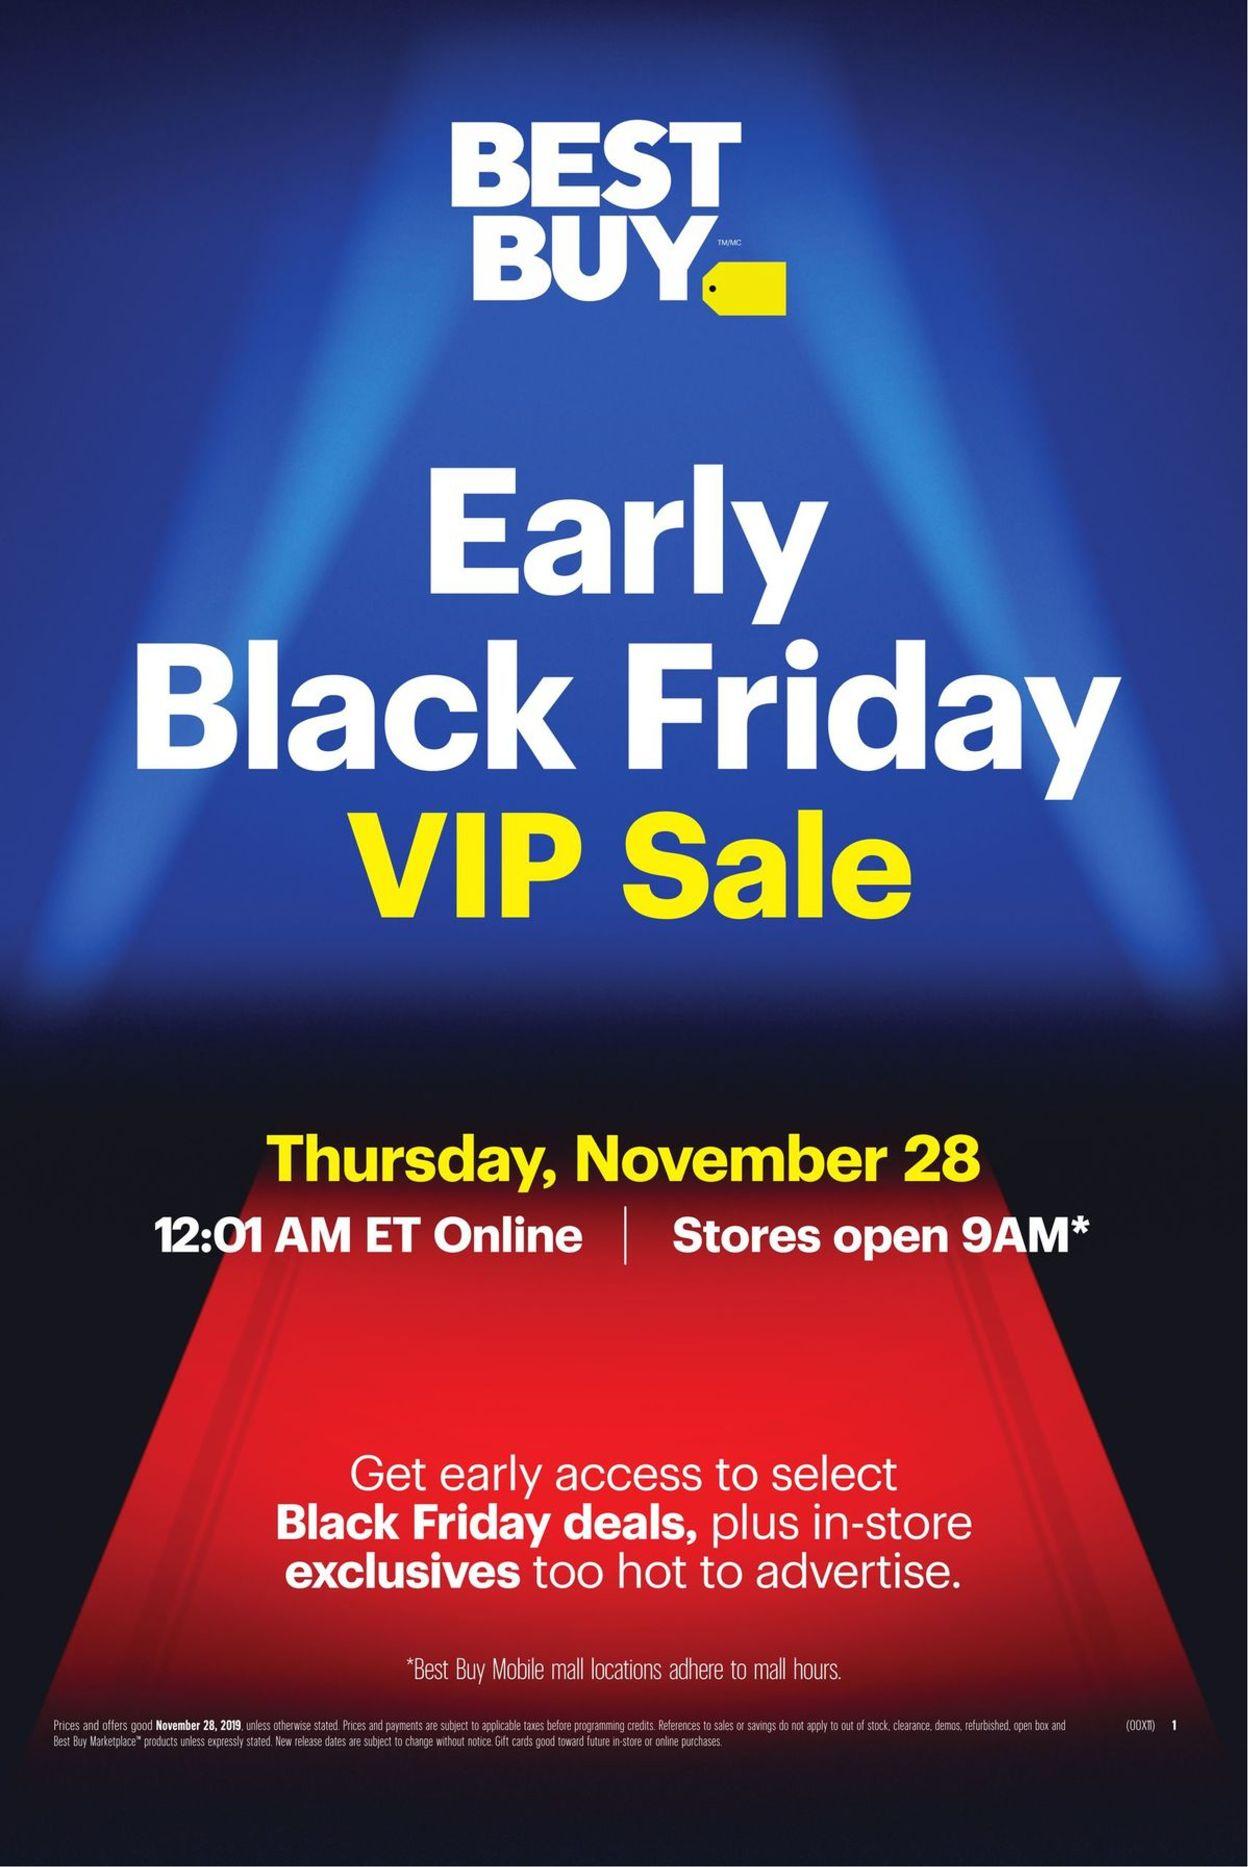 Best Buy - Early Black Friday Sale 2019 Flyer - 11/28-11/28/2019